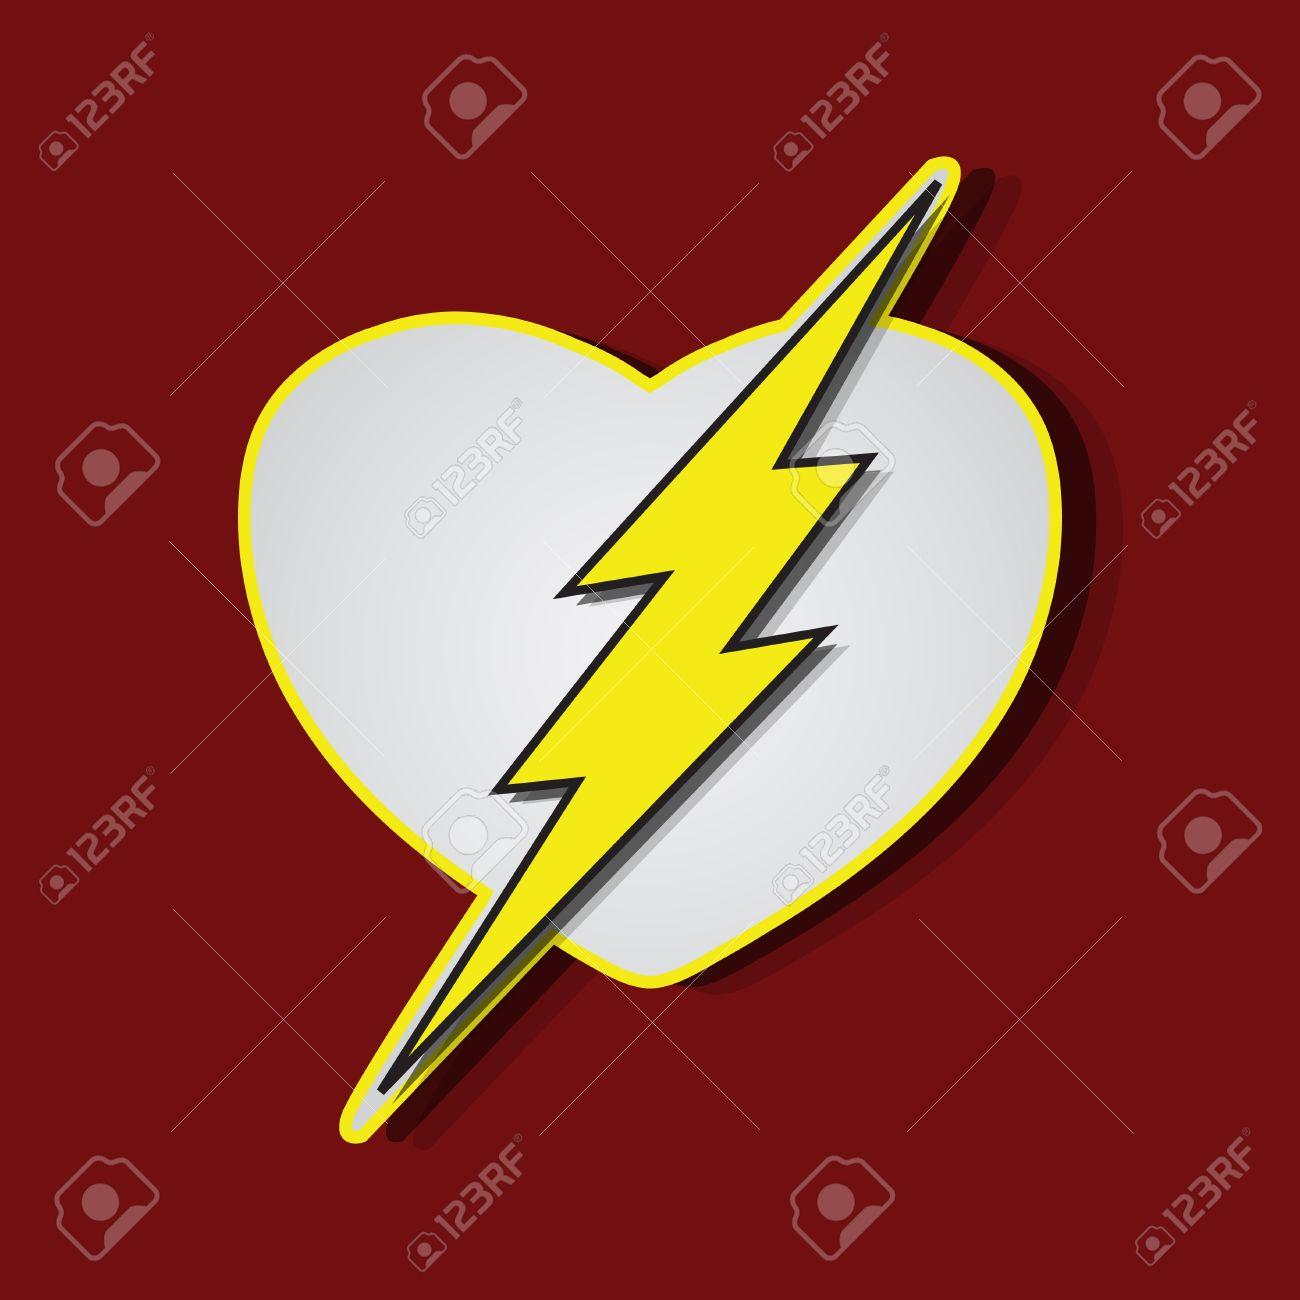 Superhero shields shaped like a hearts symbol for strong love superhero shields shaped like a hearts symbol for strong love eps10 vector stock vector buycottarizona Gallery